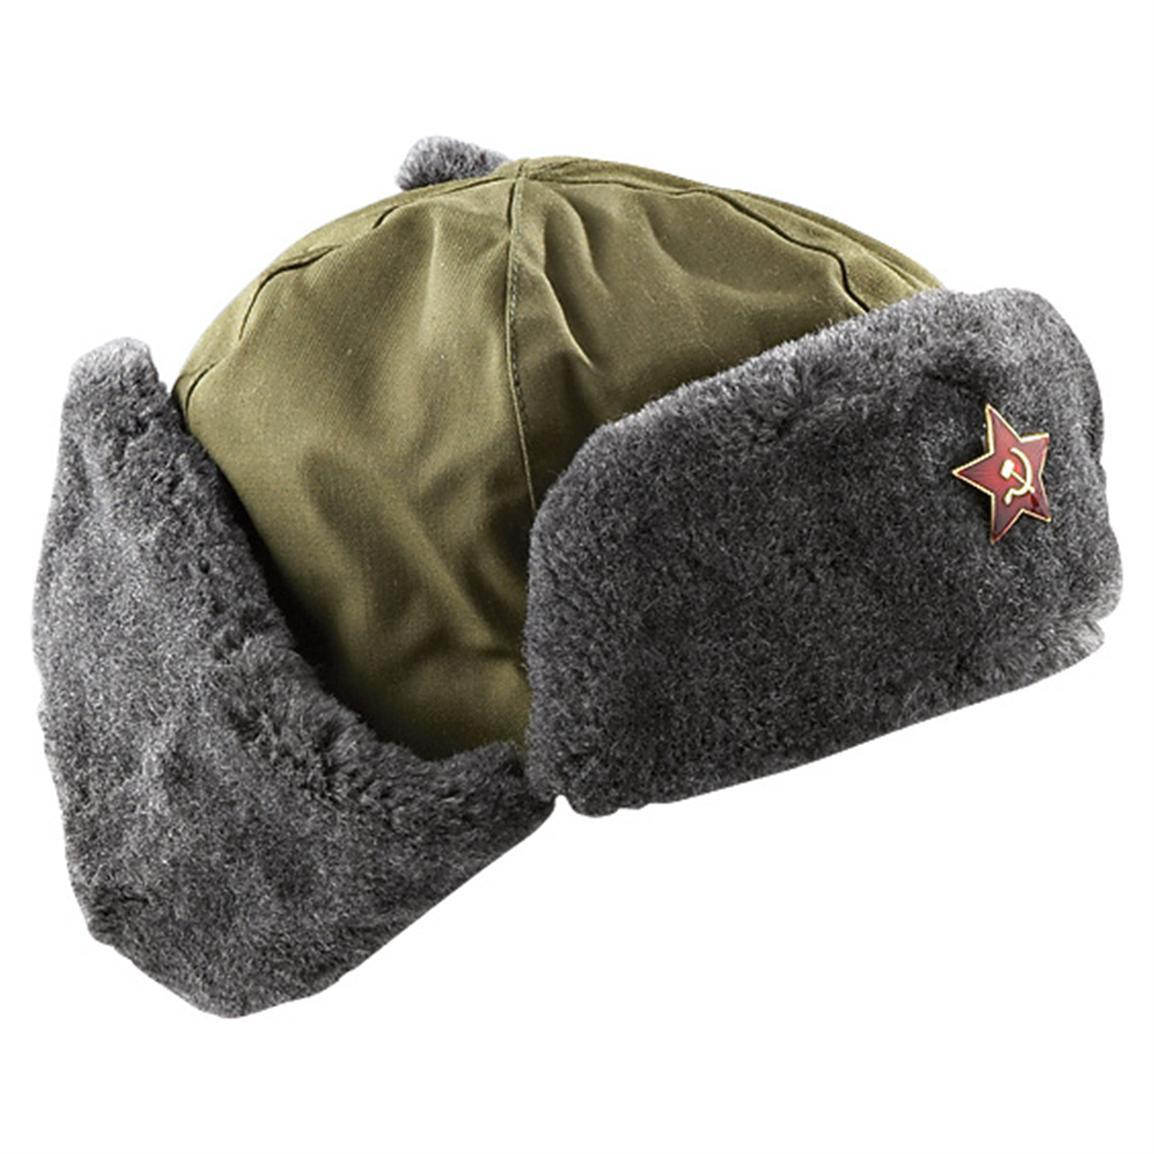 950592c63dd Vintage Czech cold war communist ushanka and similar items